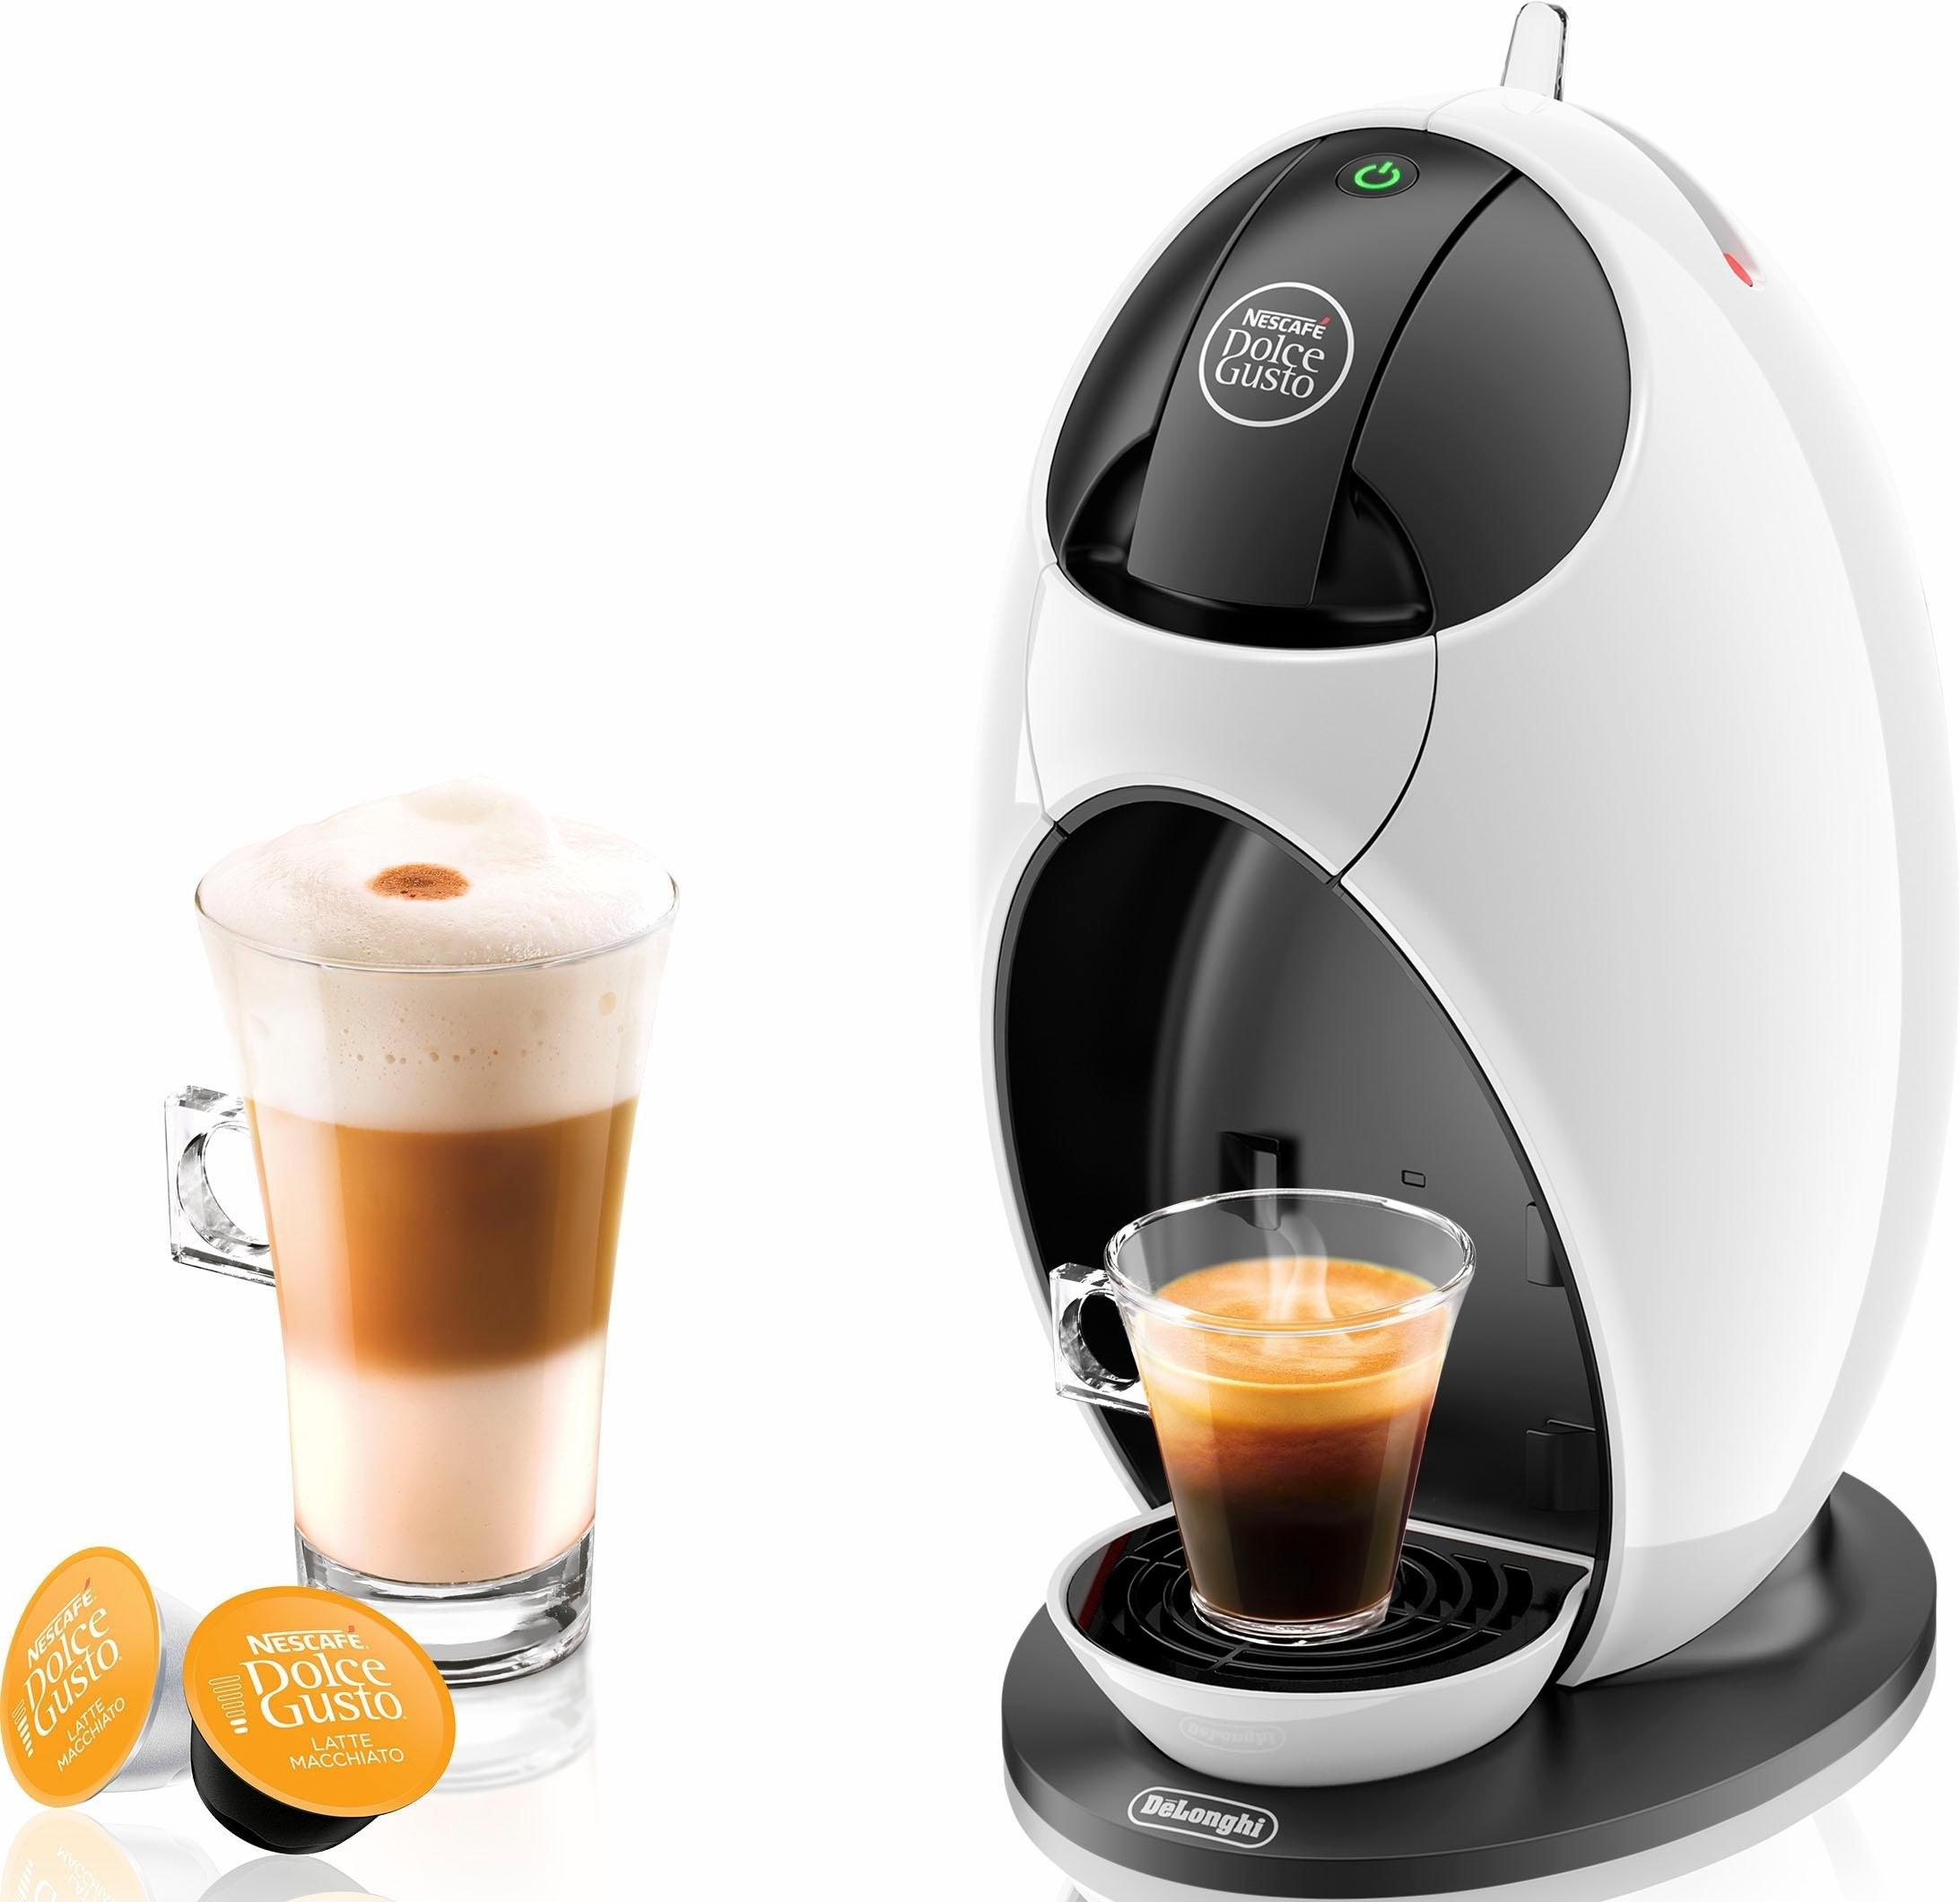 Nescafé Dolce Gusto DELONGHI Koffiecapsulemachine Jovia EDG 250.W - gratis ruilen op otto.nl